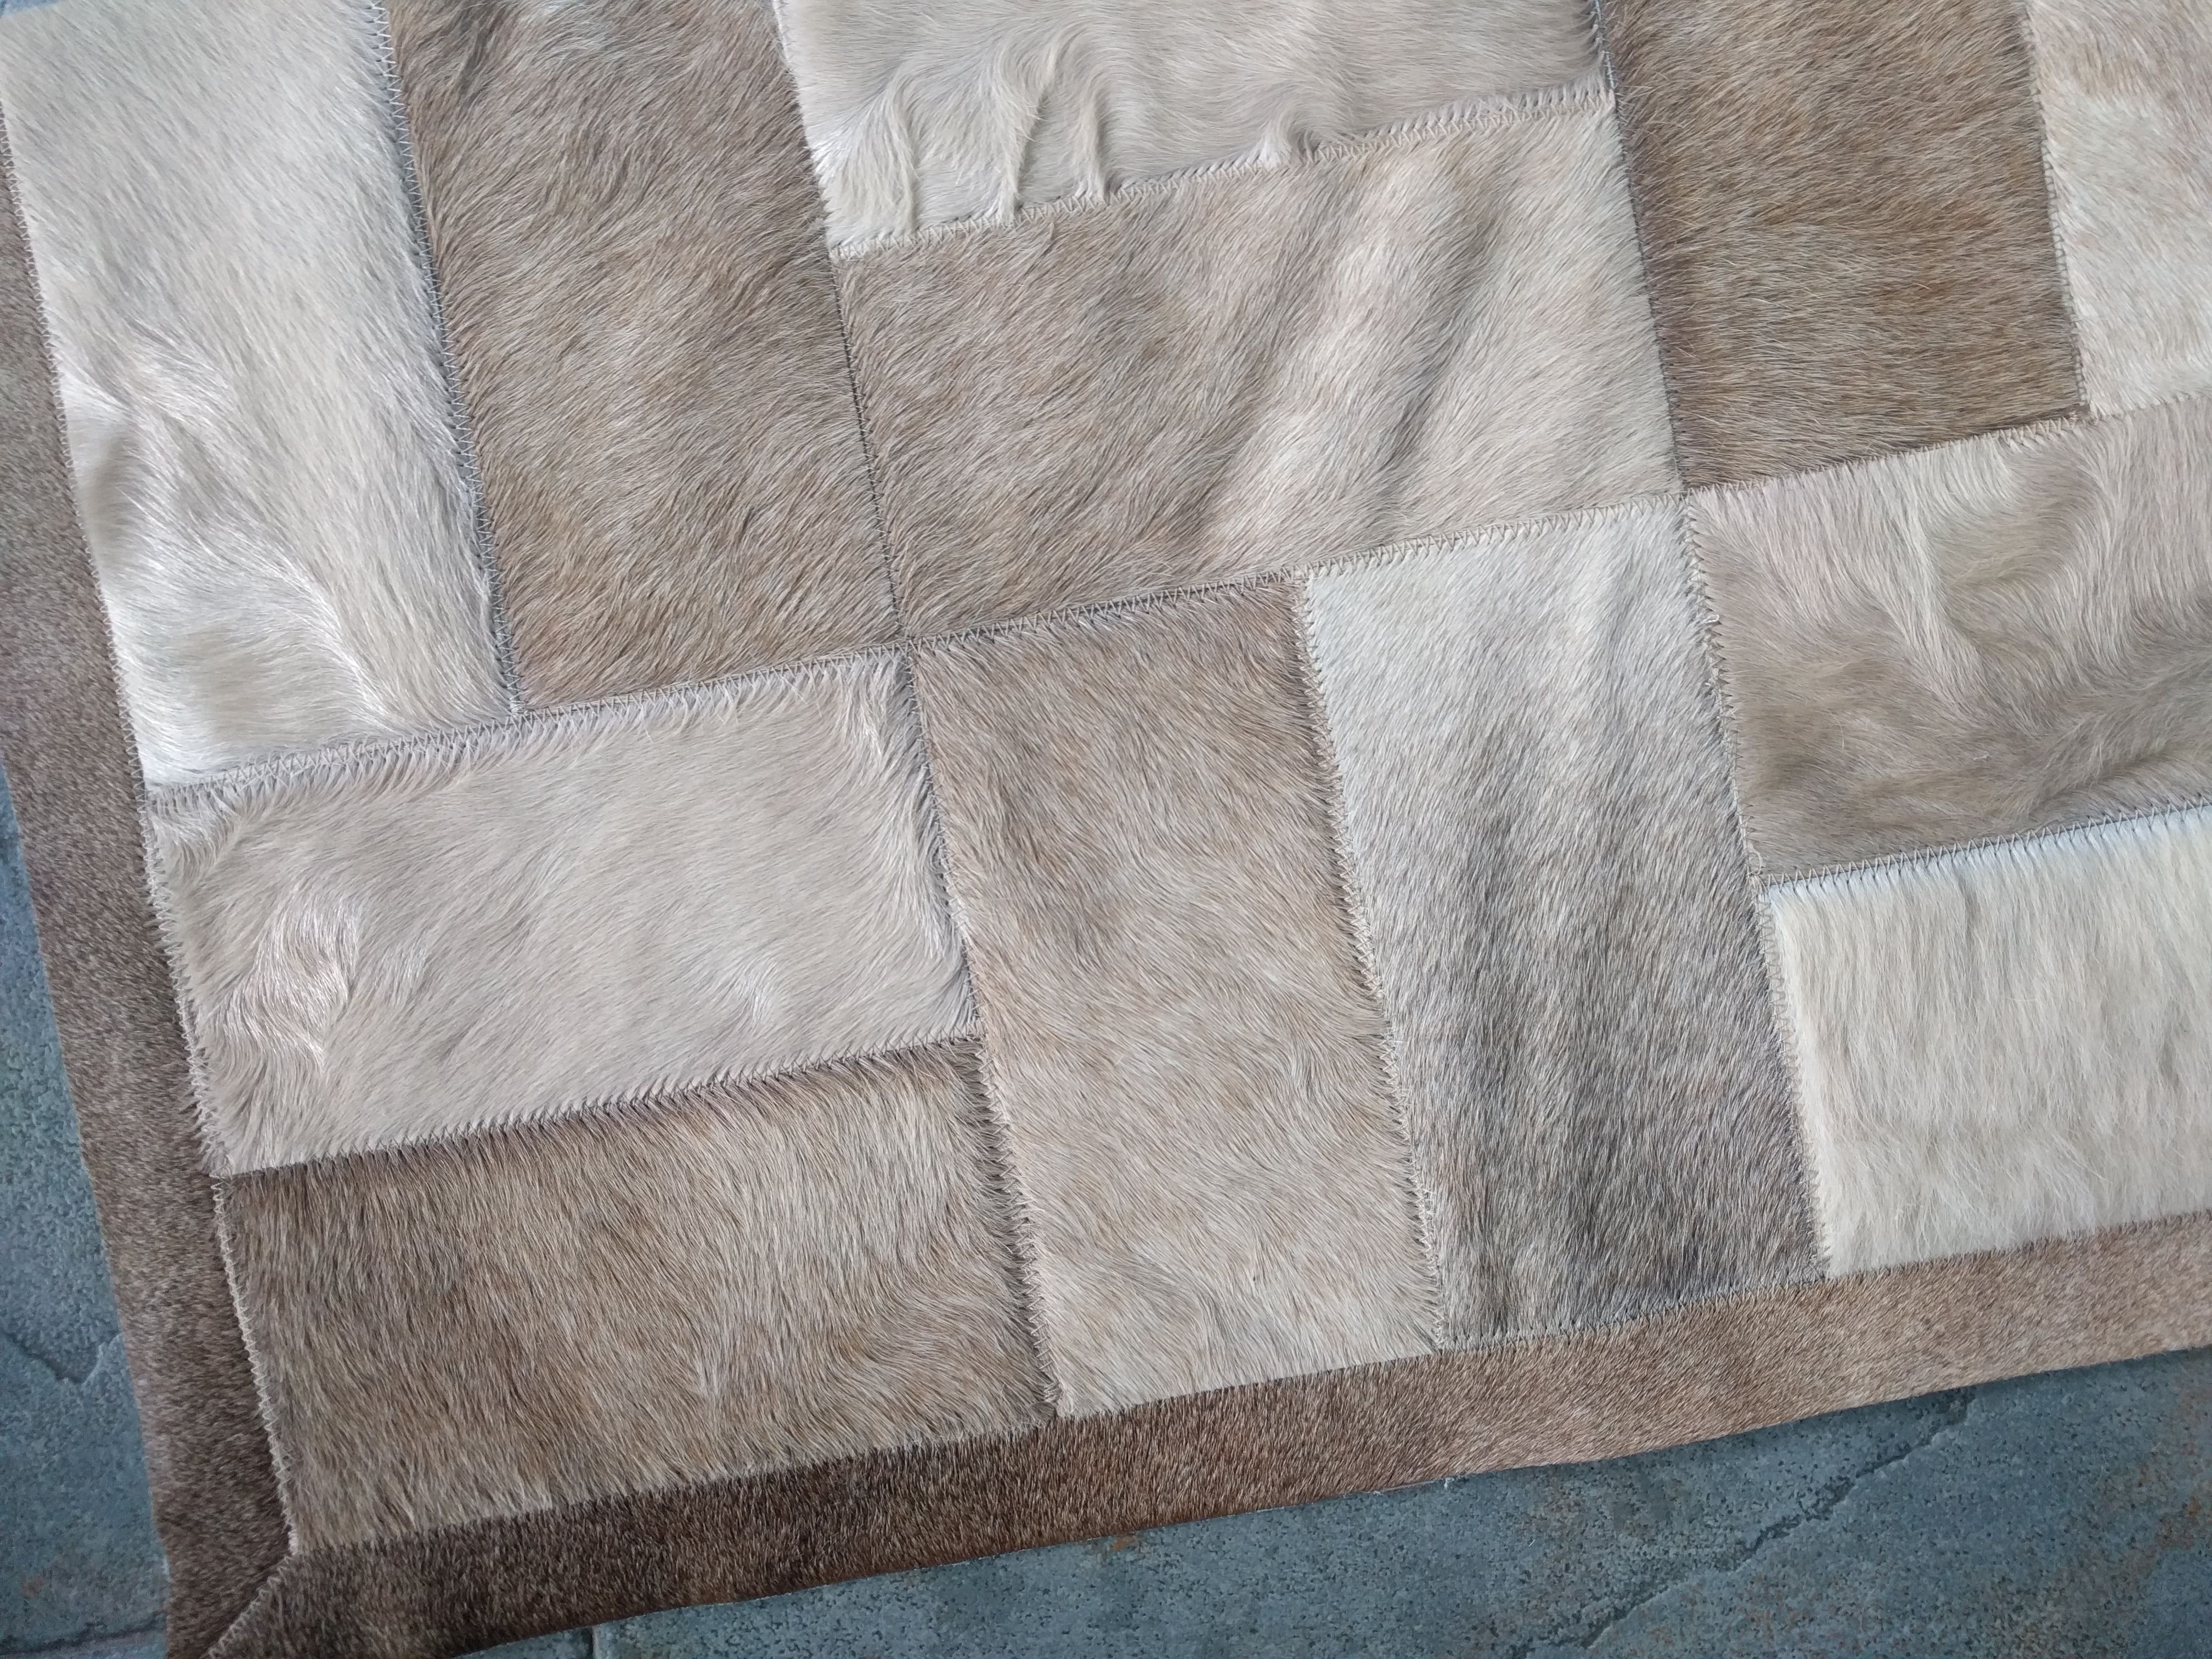 So Soft And Warm Natural Soft Beige Bricks Patchwork Cowhide Rug Shinerugs Com Patchwork Cowhide Rug Patchwork Cowhide Cowhide Patch Rug